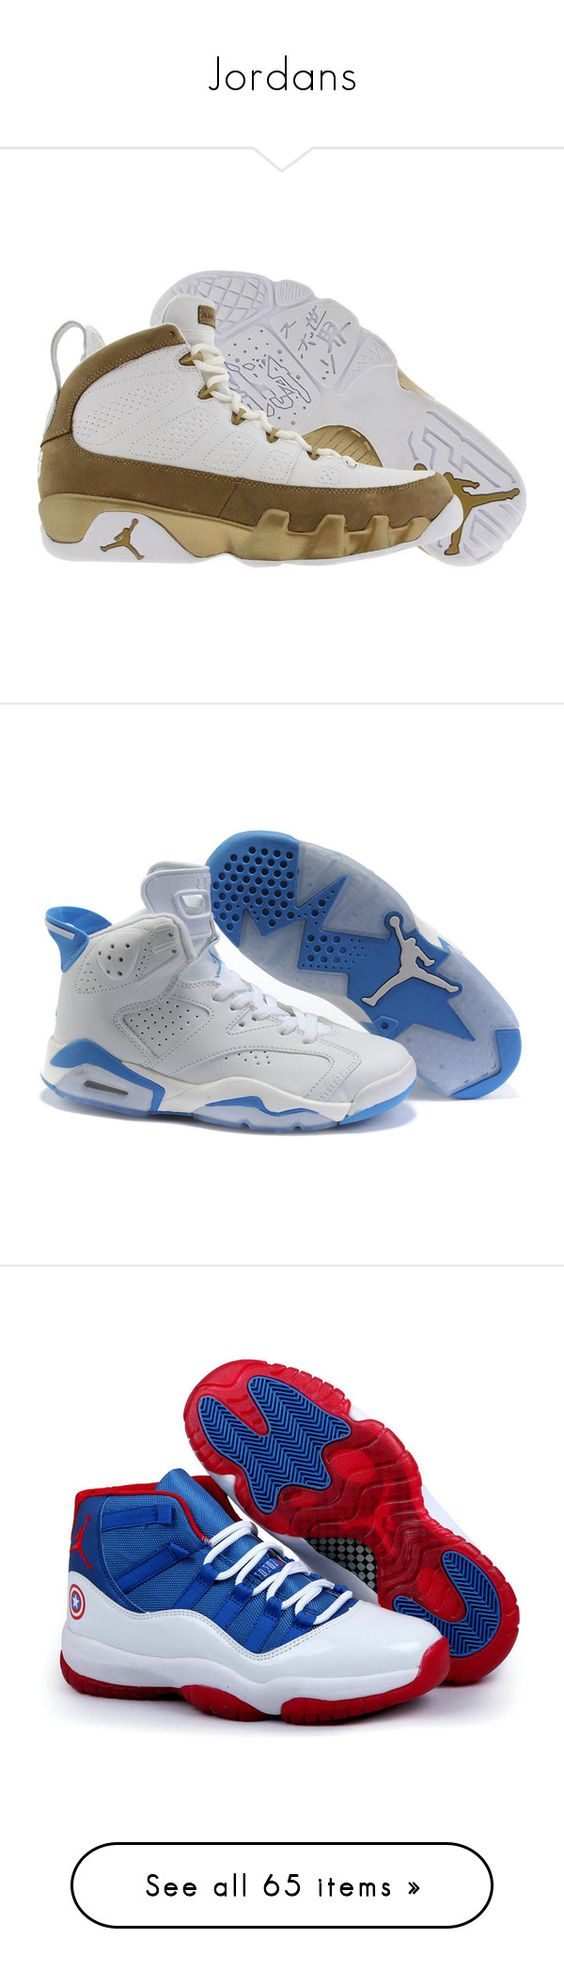 """Jordans"" by emayam54 ❤ liked on Polyvore featuring shoes, jordans, sneakers, jordan 11, kohl shoes, black polishable shoes, black pink sneakers, pink shoes, polish shoes and air jordan 4"